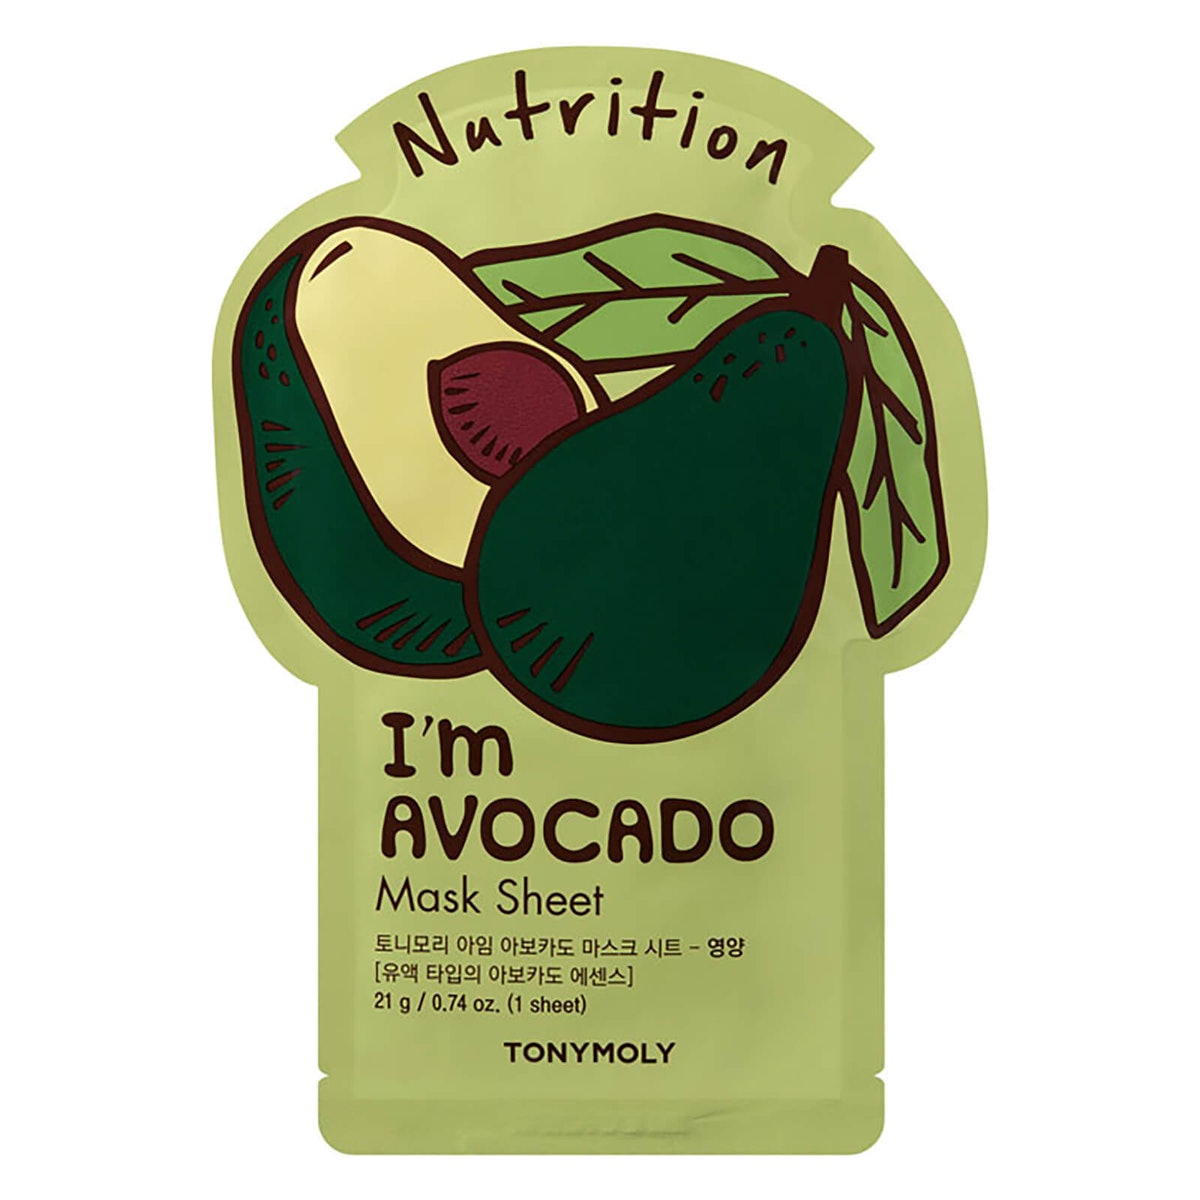 I'm Real Avocado Mask Sheet